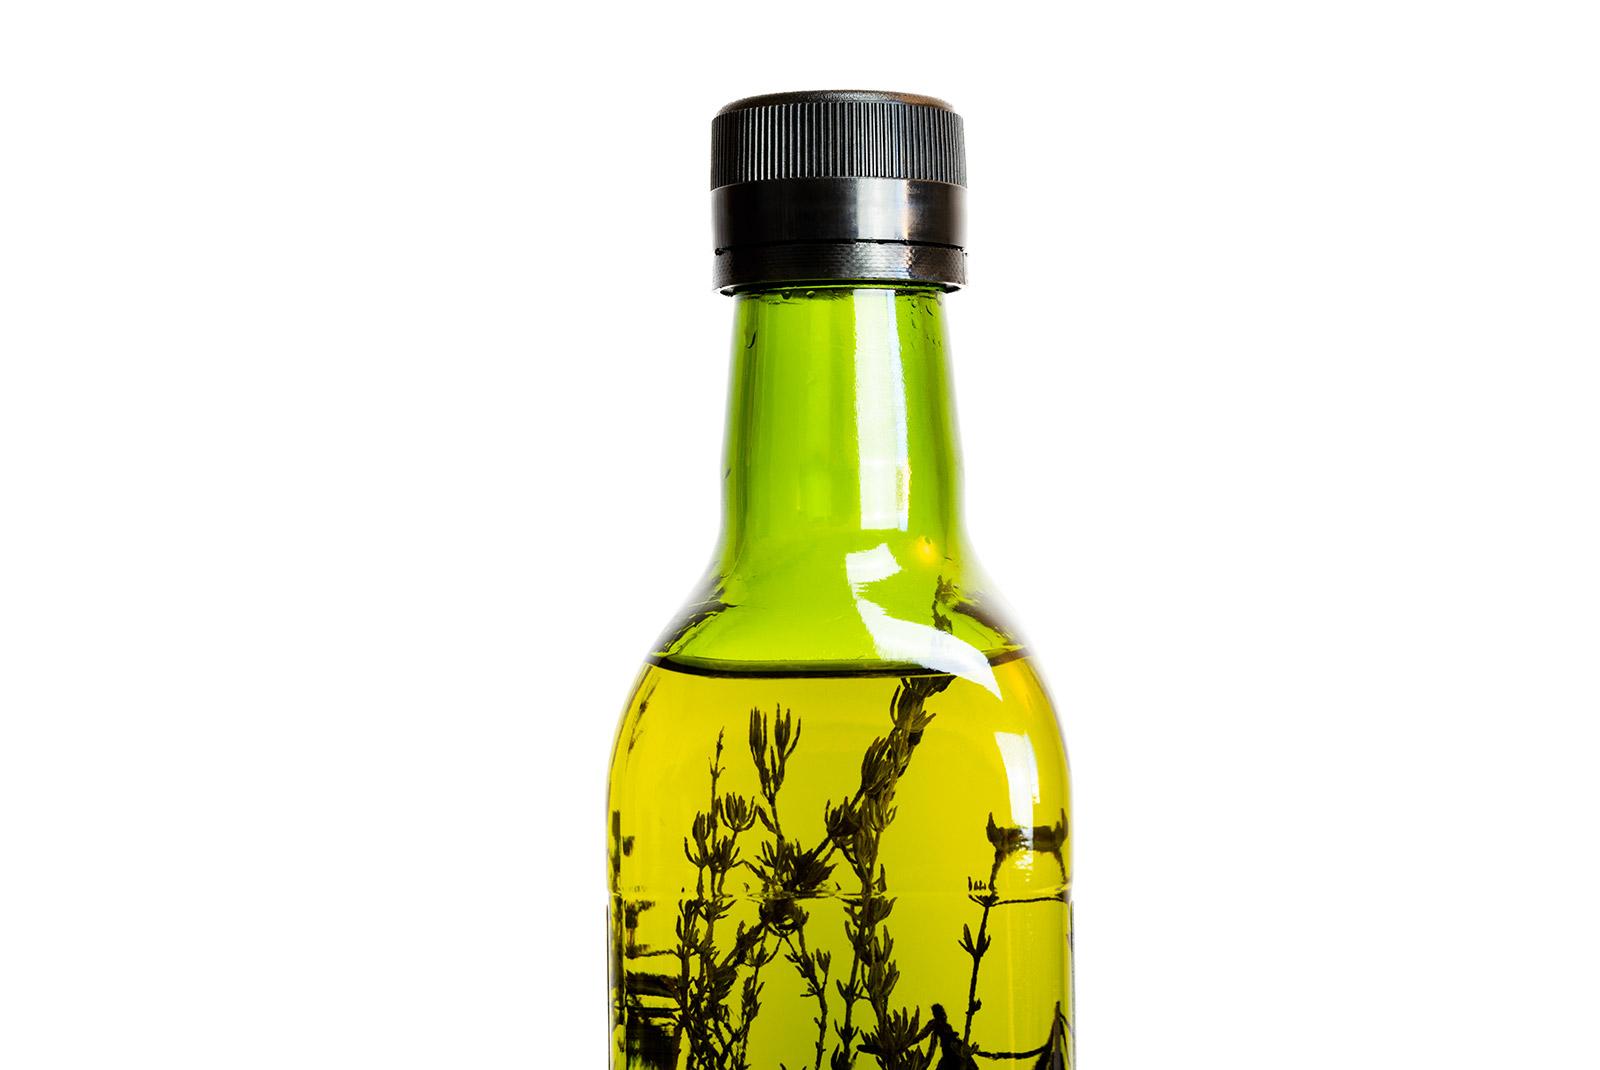 Différentes Variétés De Thym huile d'olive vierge extra , thym romarin 50cl